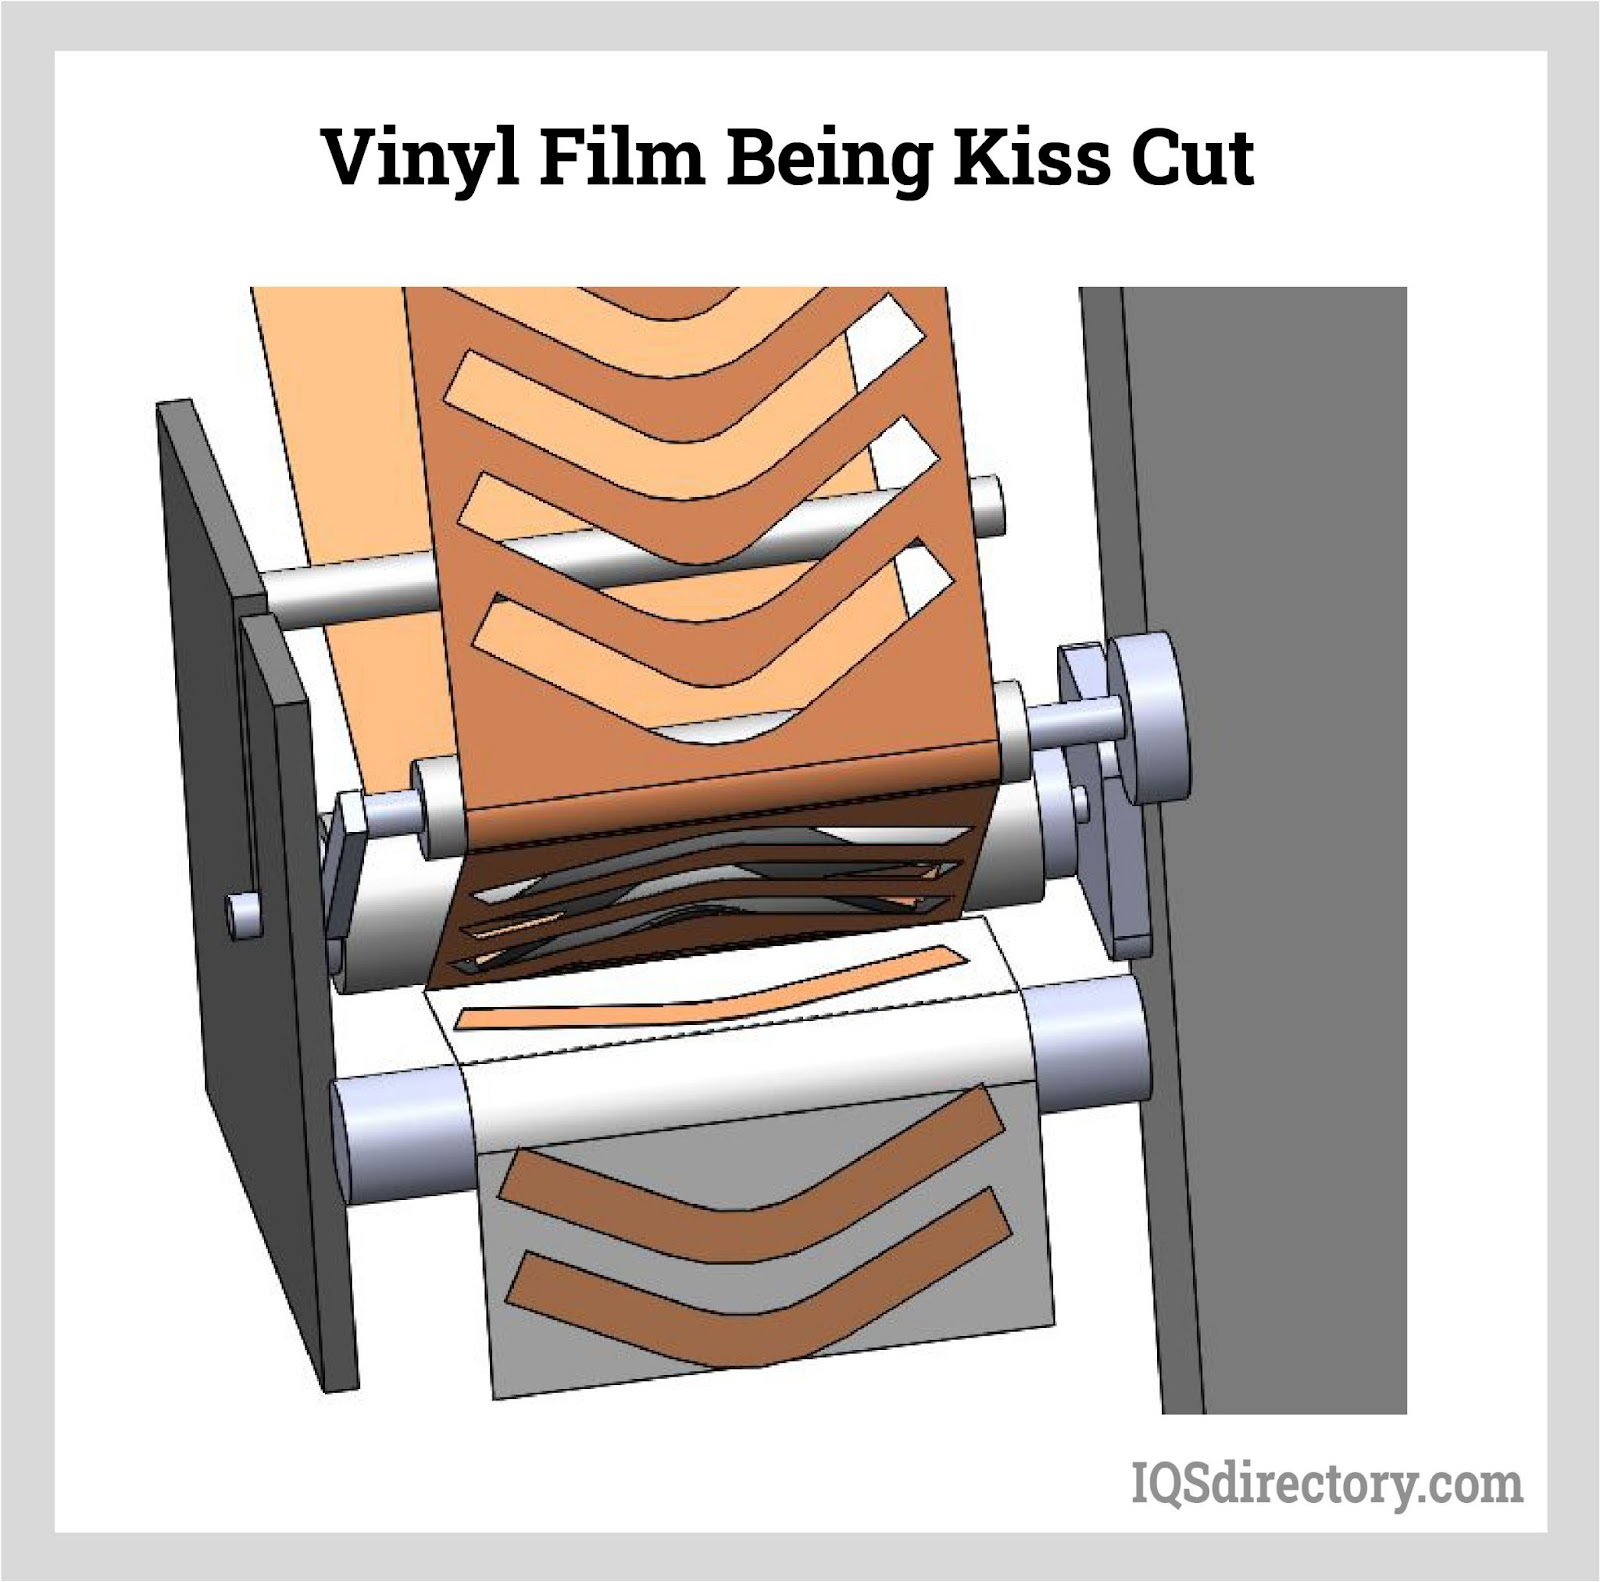 Vinyl Film Being Kiss Cut